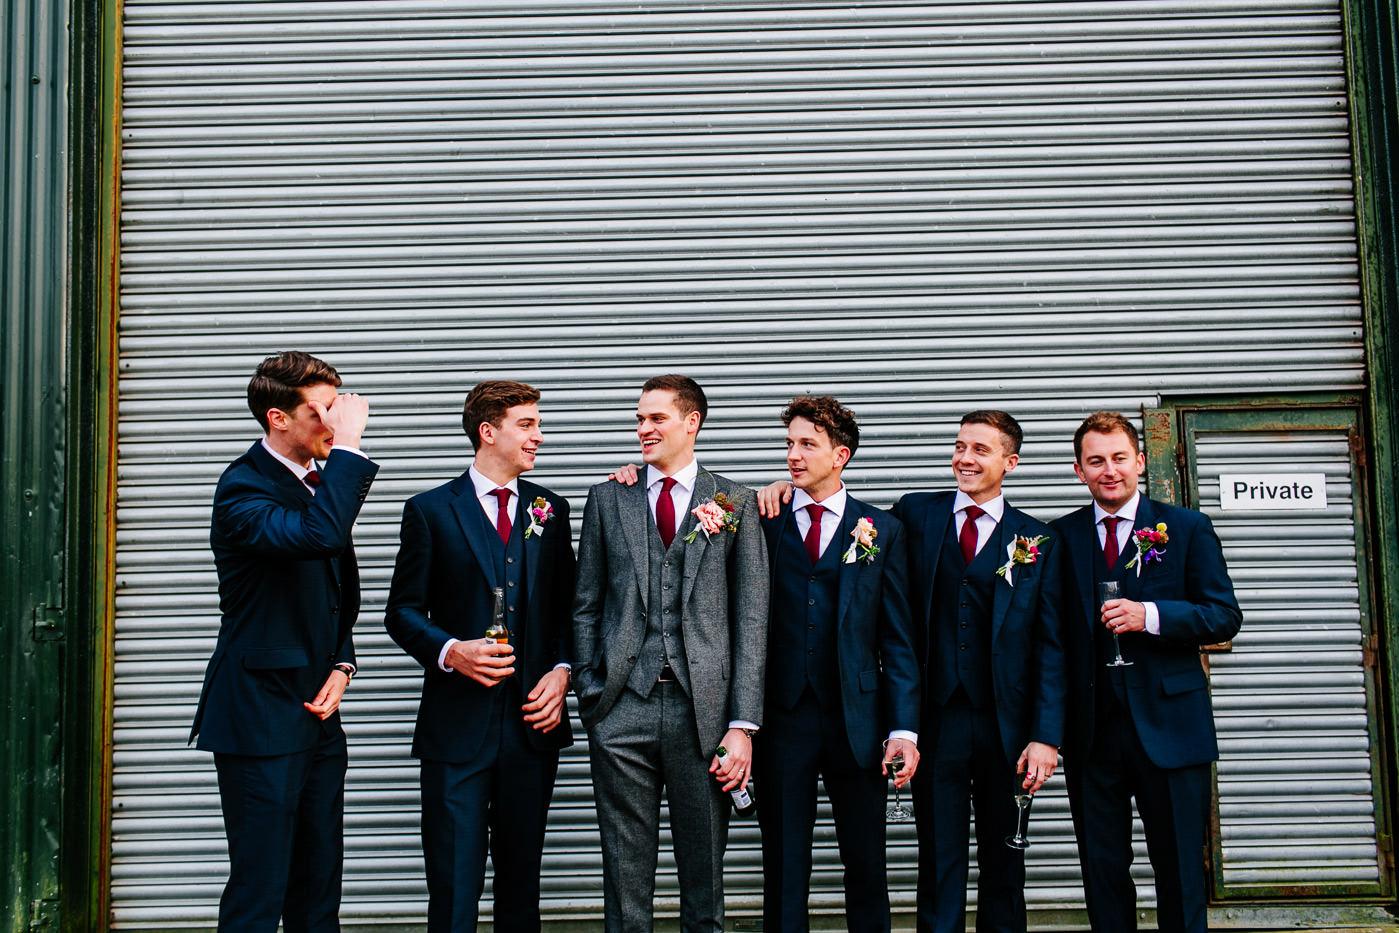 colourful-upwaltham-barns-sussex-wedding-photographer-054